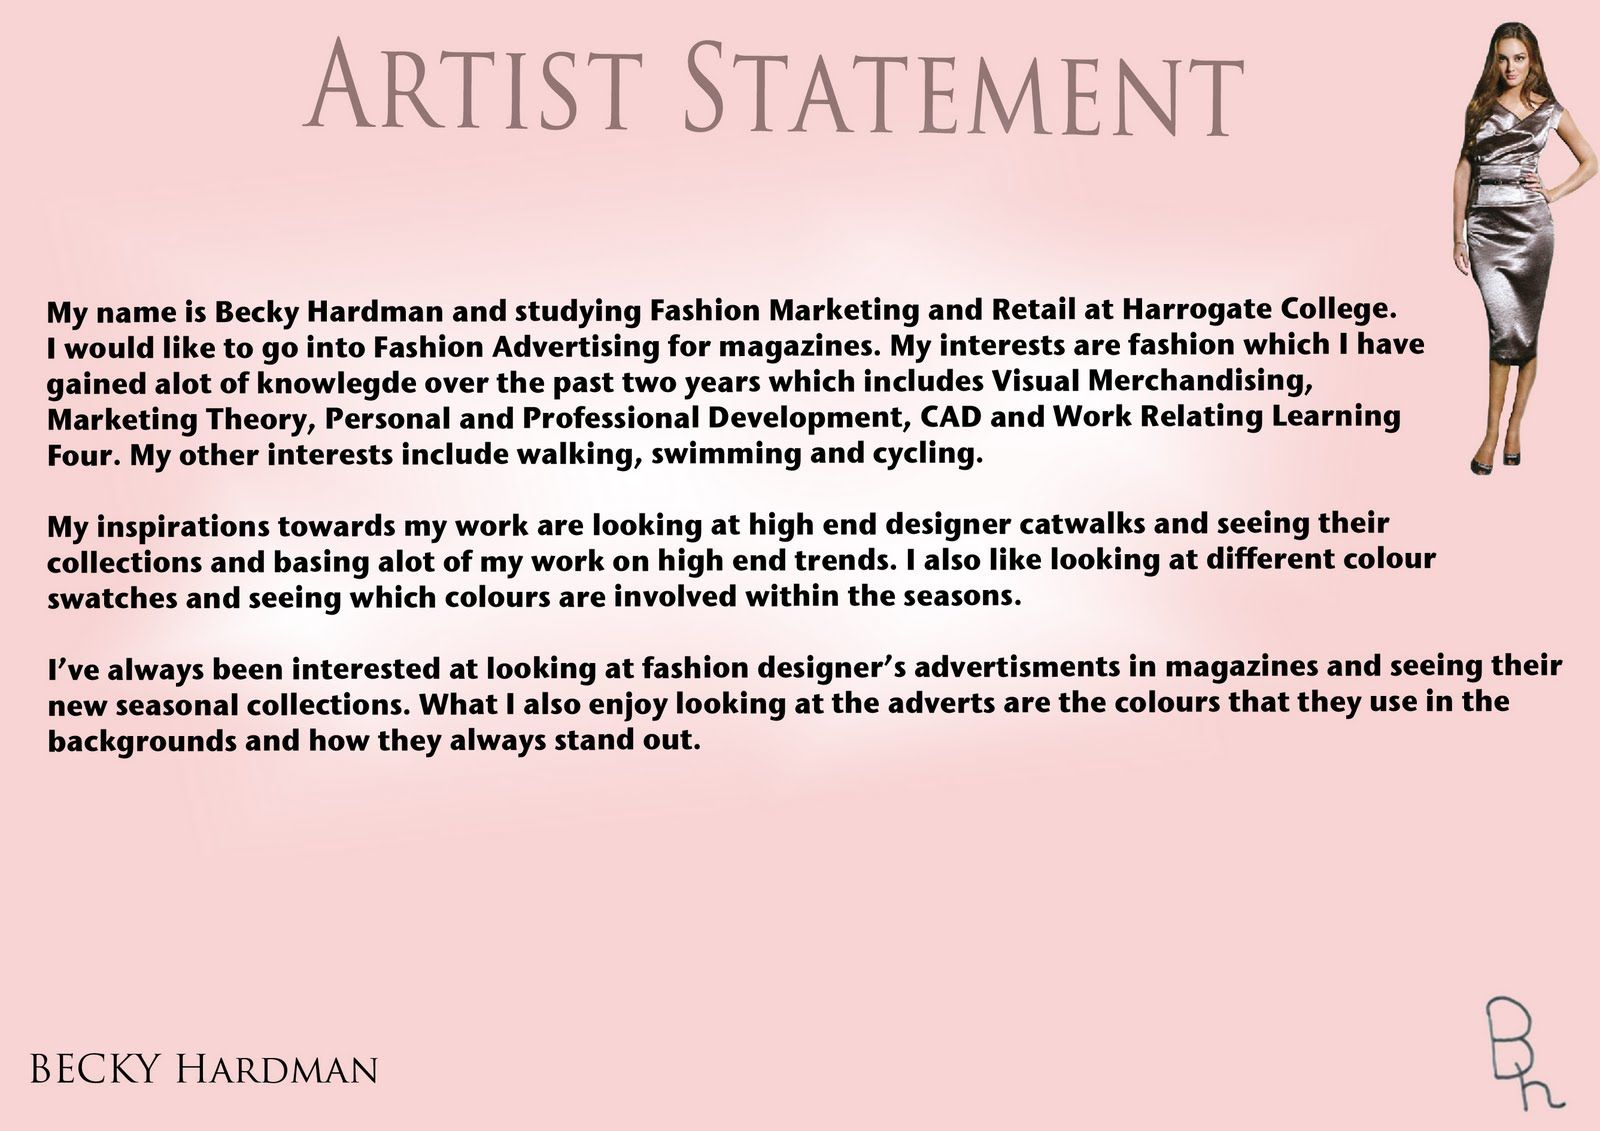 Artist Statement Worksheet | Printable Worksheets And Activities For  Teachers, Parents, Tutors And Homeschool Families